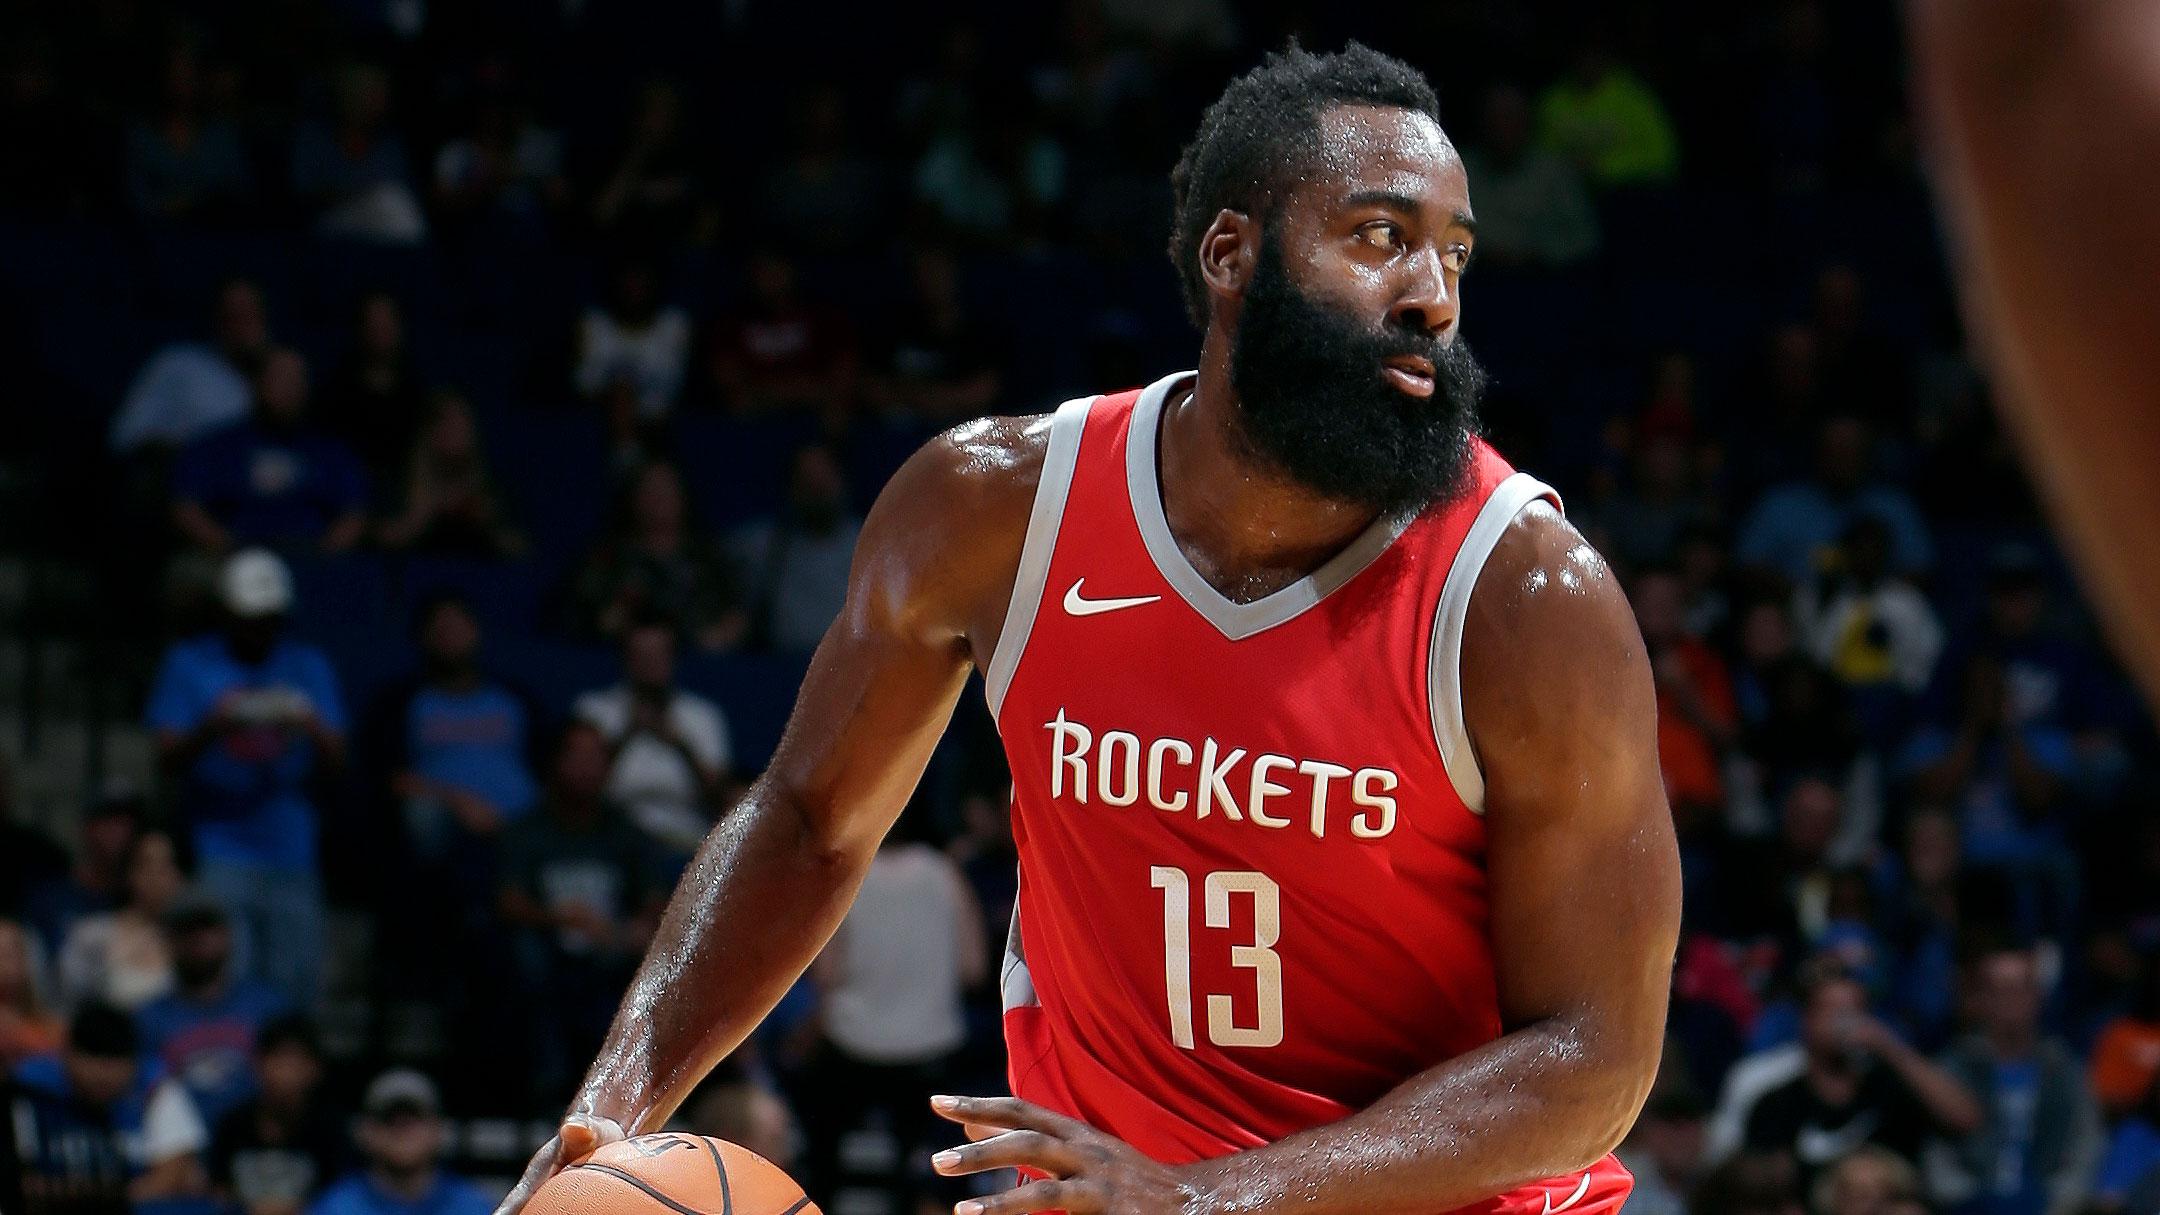 NBA Fantasy: Top Performers of The Season